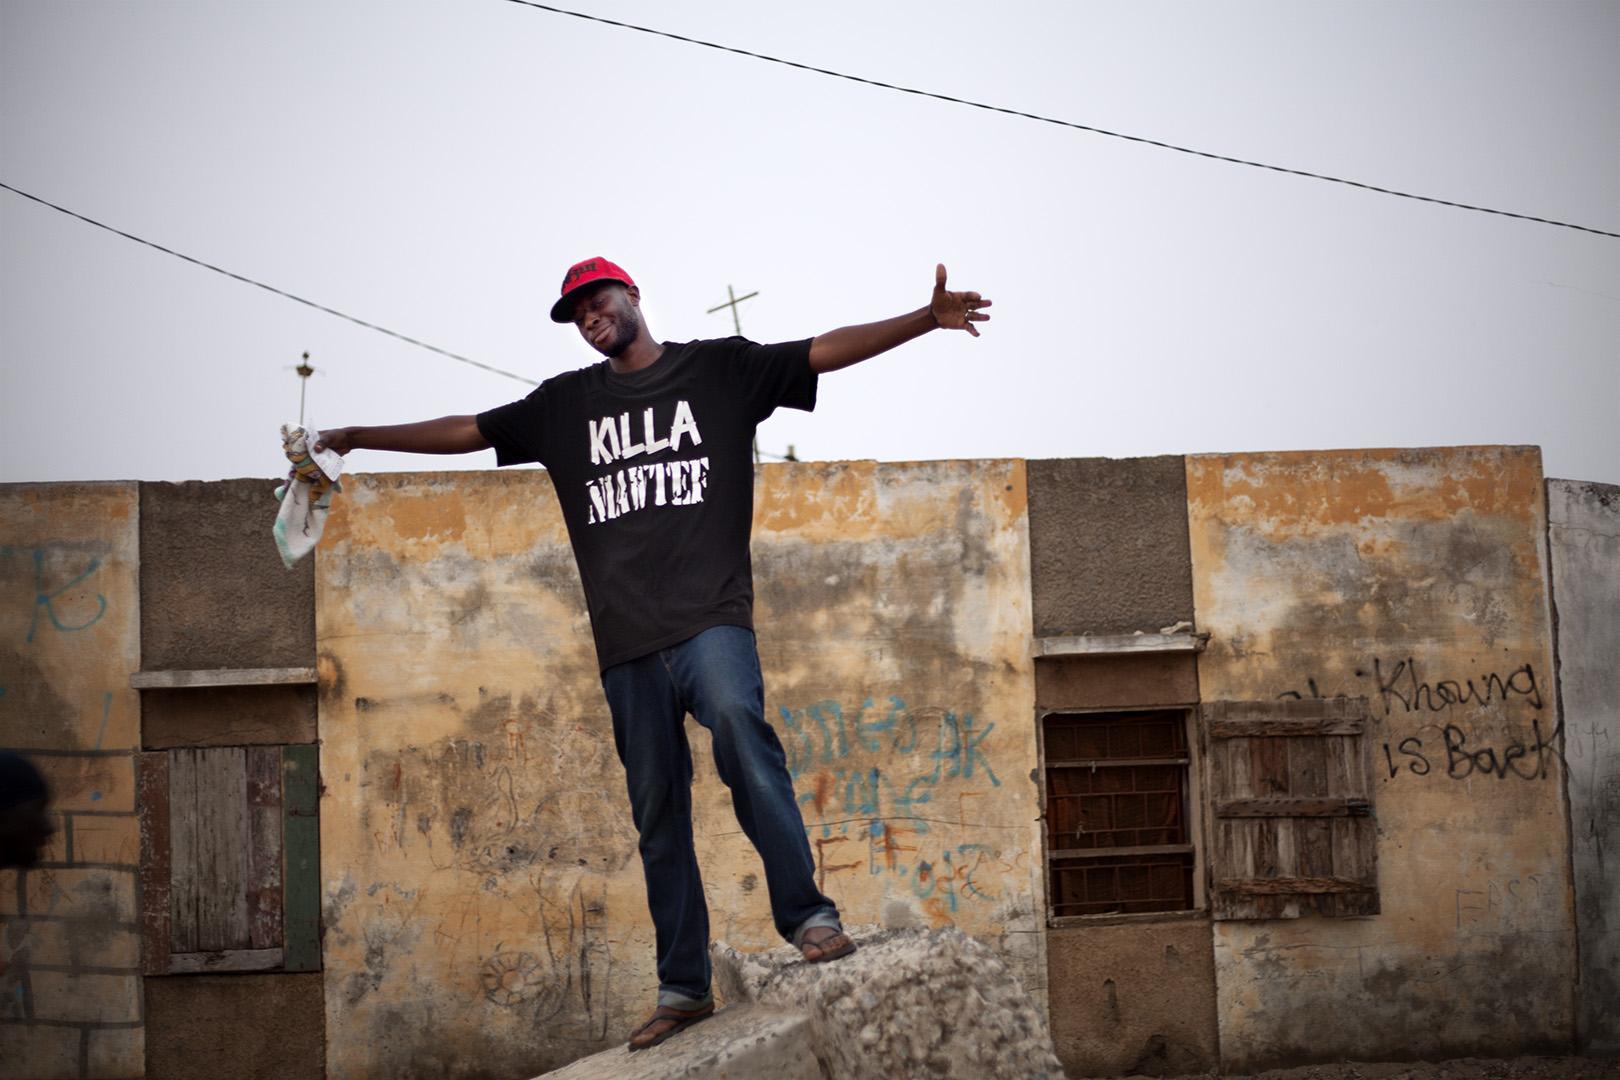 Harbage_Dakar_15.jpg